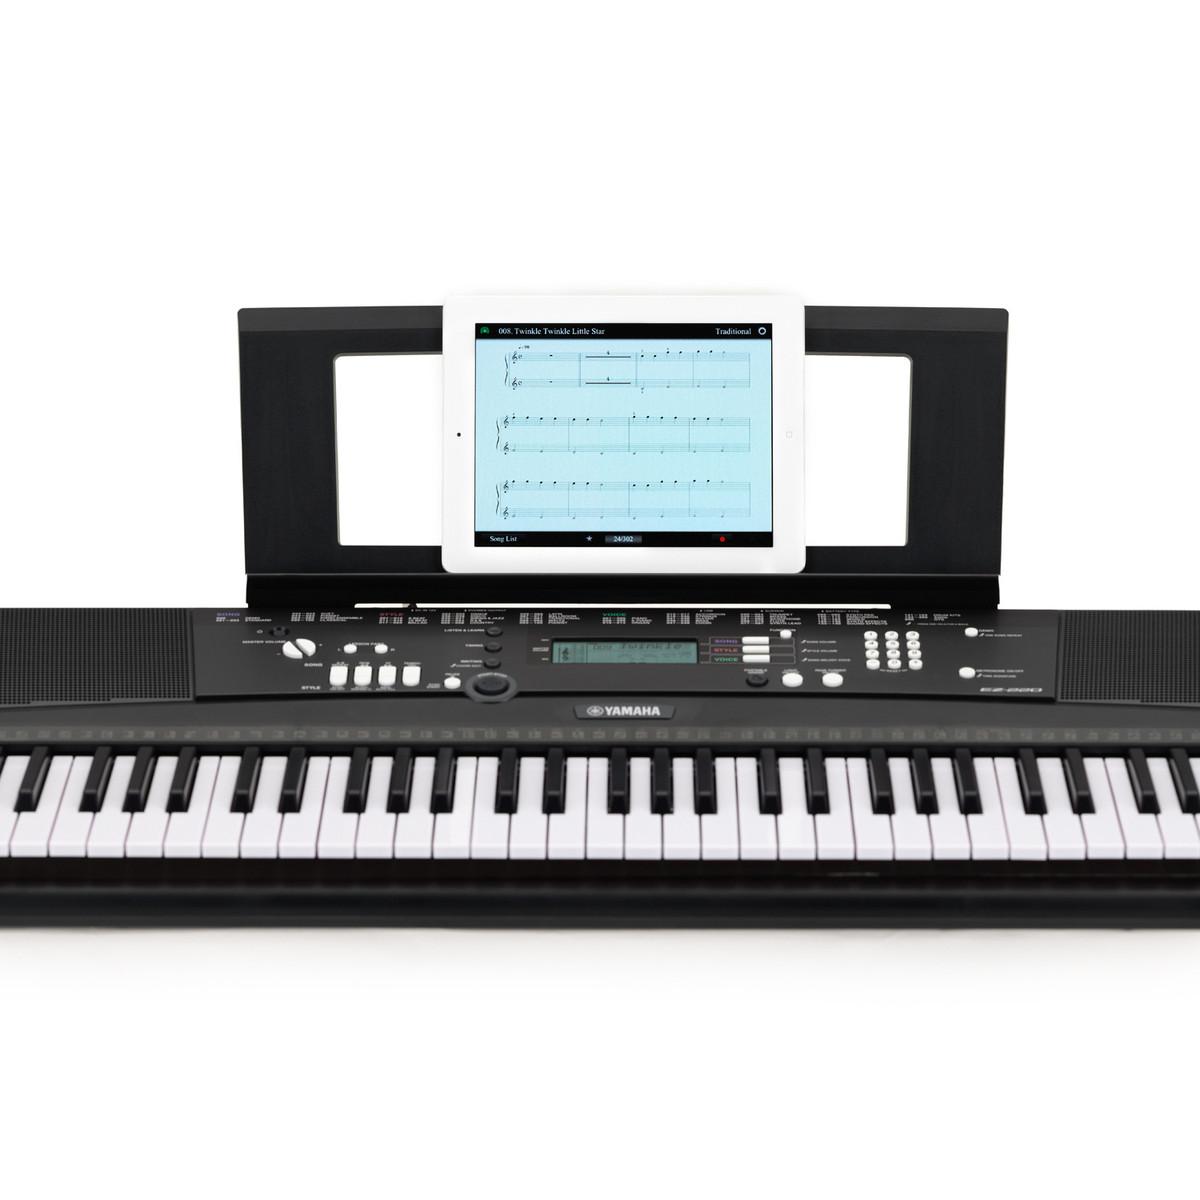 yamaha ez220 61 key lighting keyboard at gear4music. Black Bedroom Furniture Sets. Home Design Ideas